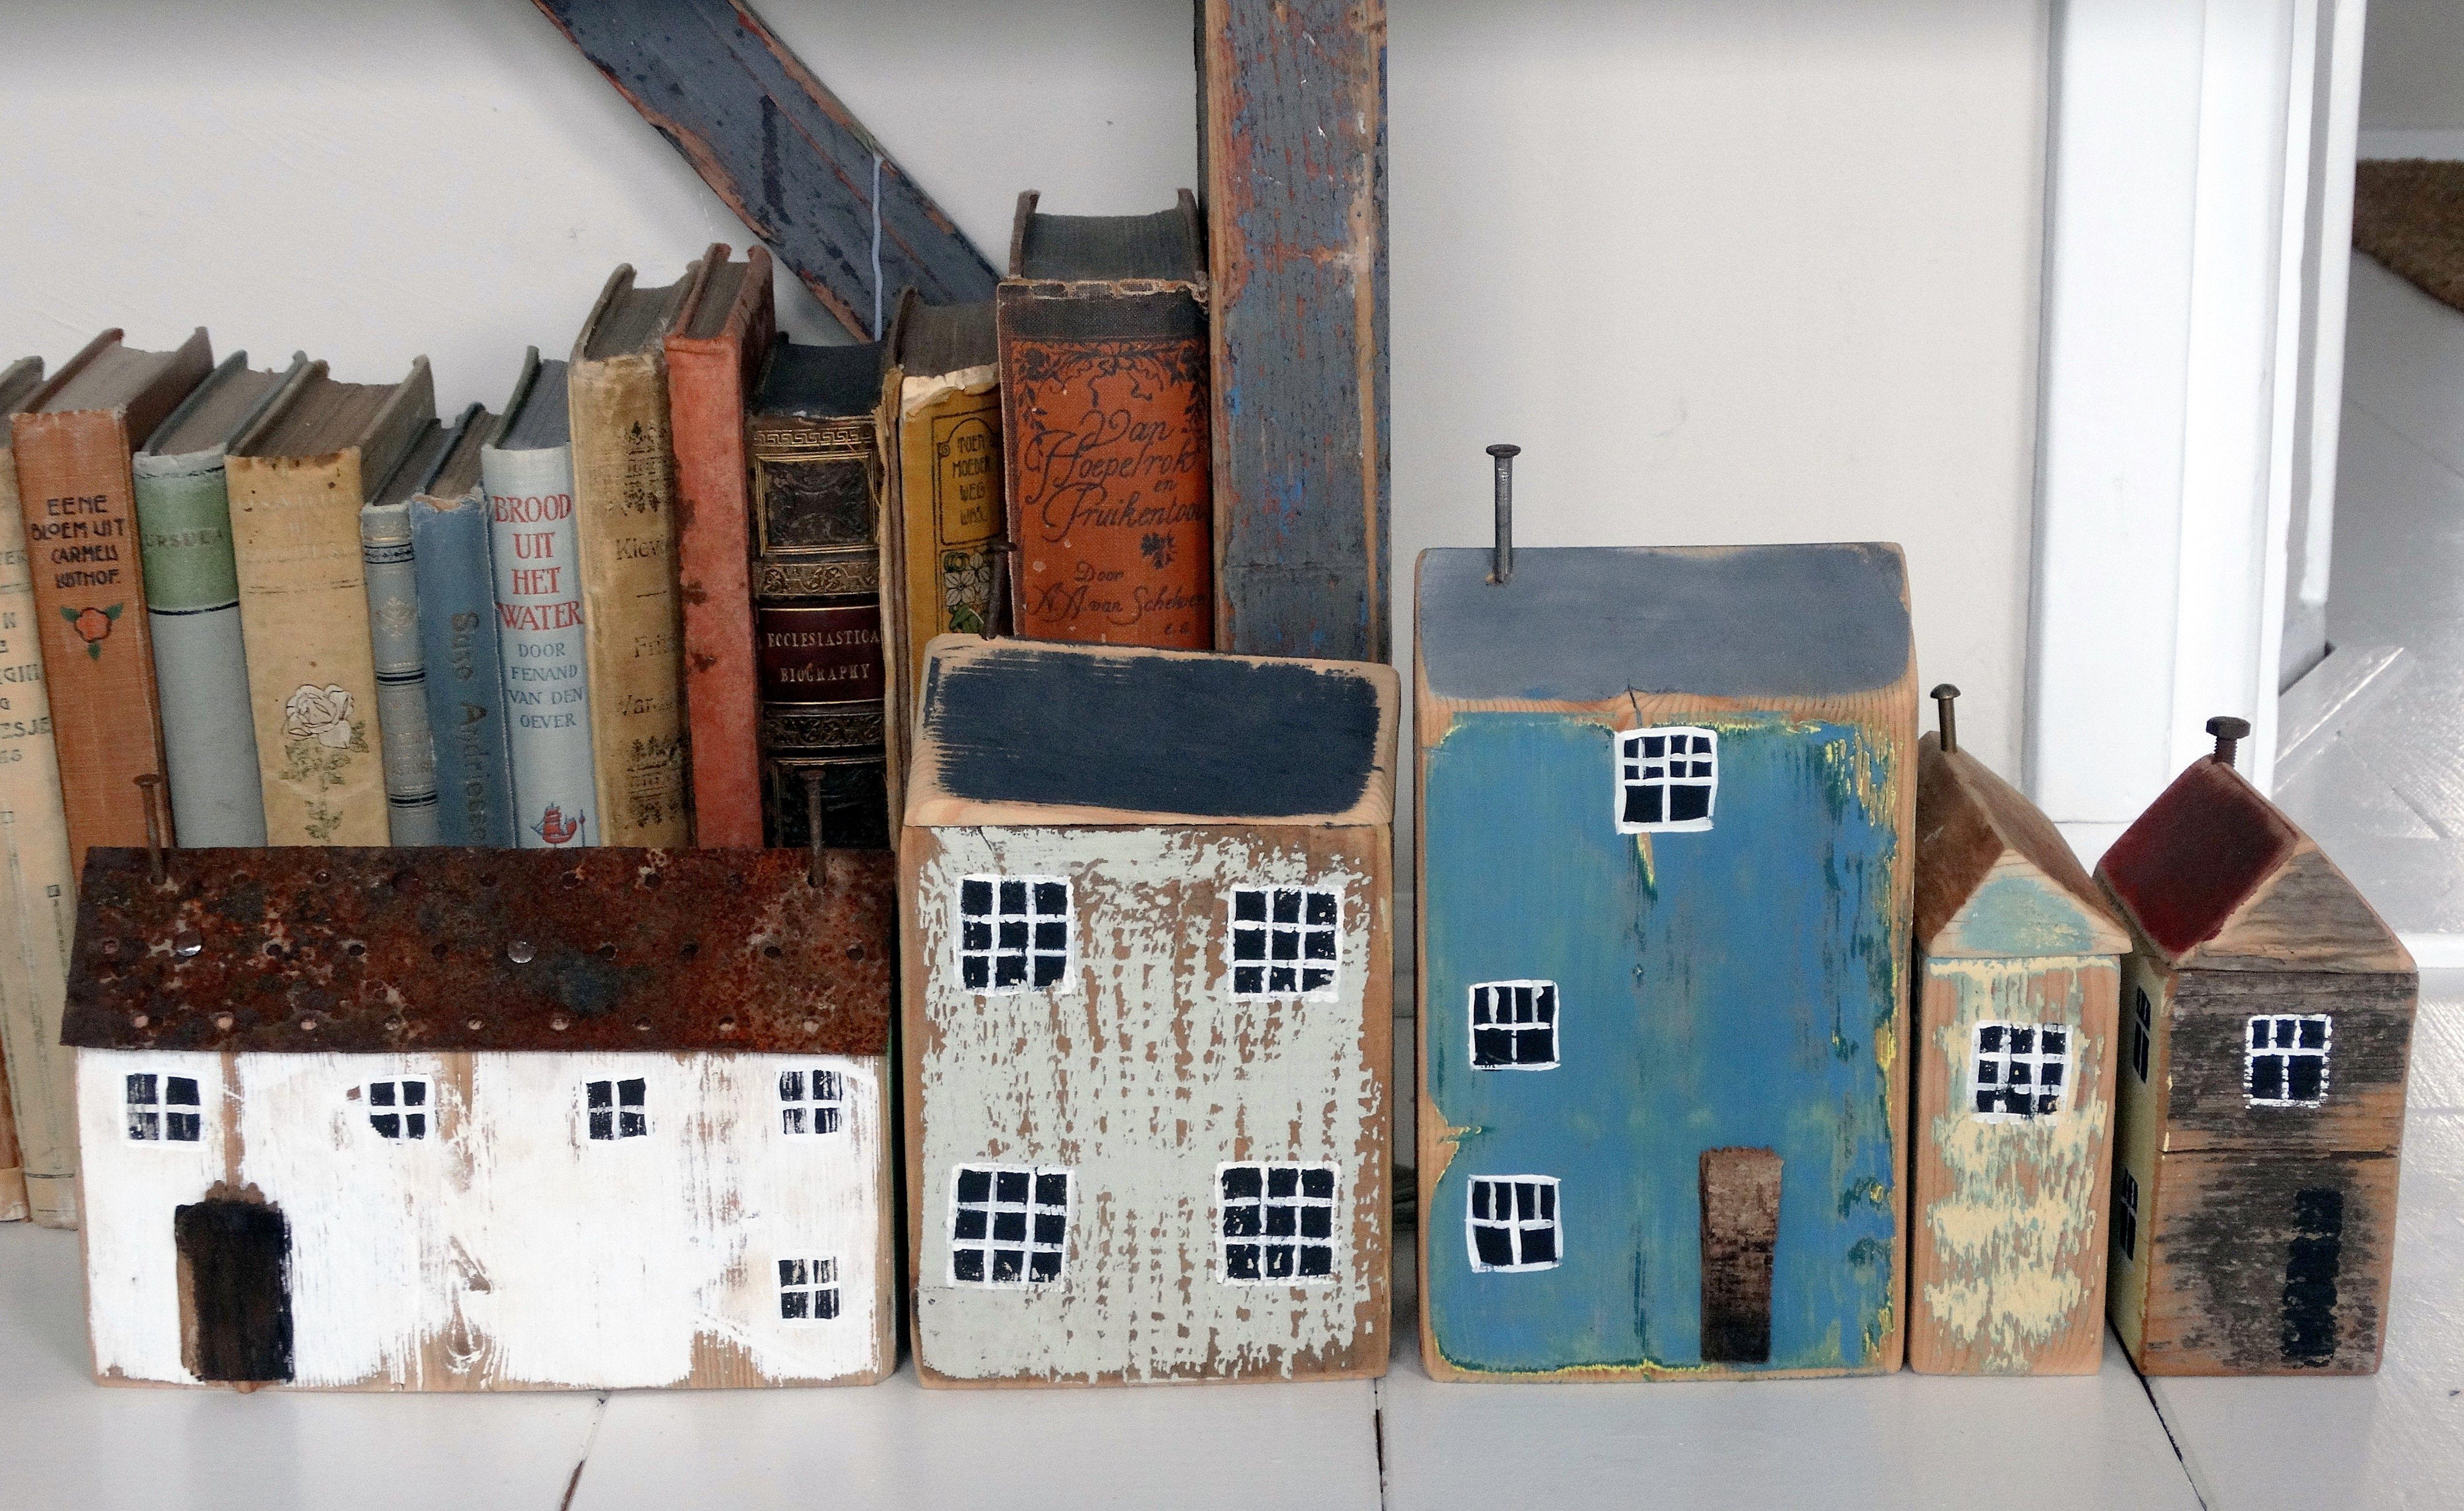 maria 39 s huisjes mini houses pinterest treibholz holz und haus. Black Bedroom Furniture Sets. Home Design Ideas